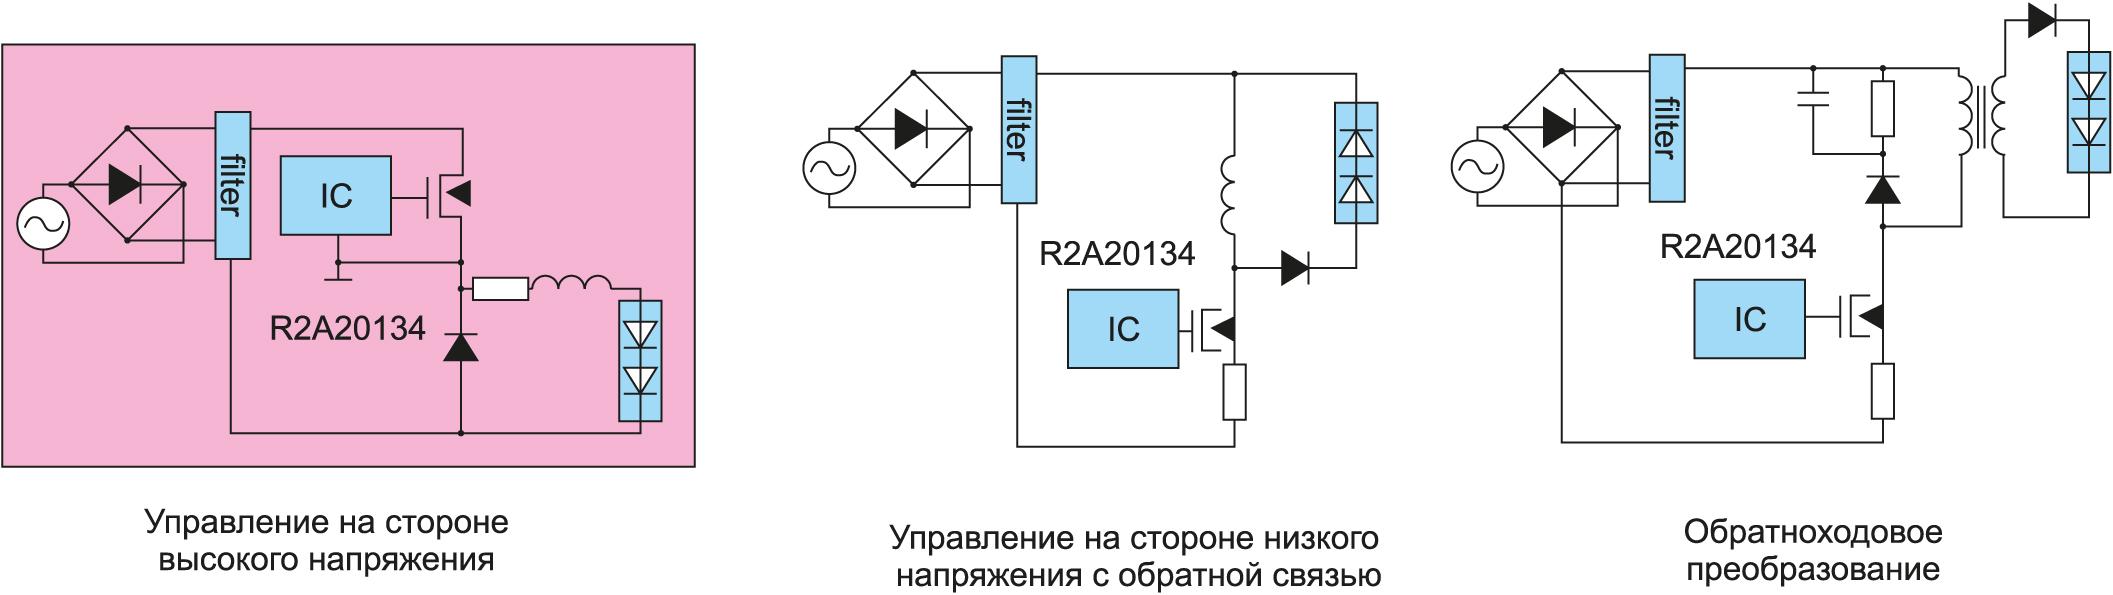 Схемы включения R2A20134 и R2A20135